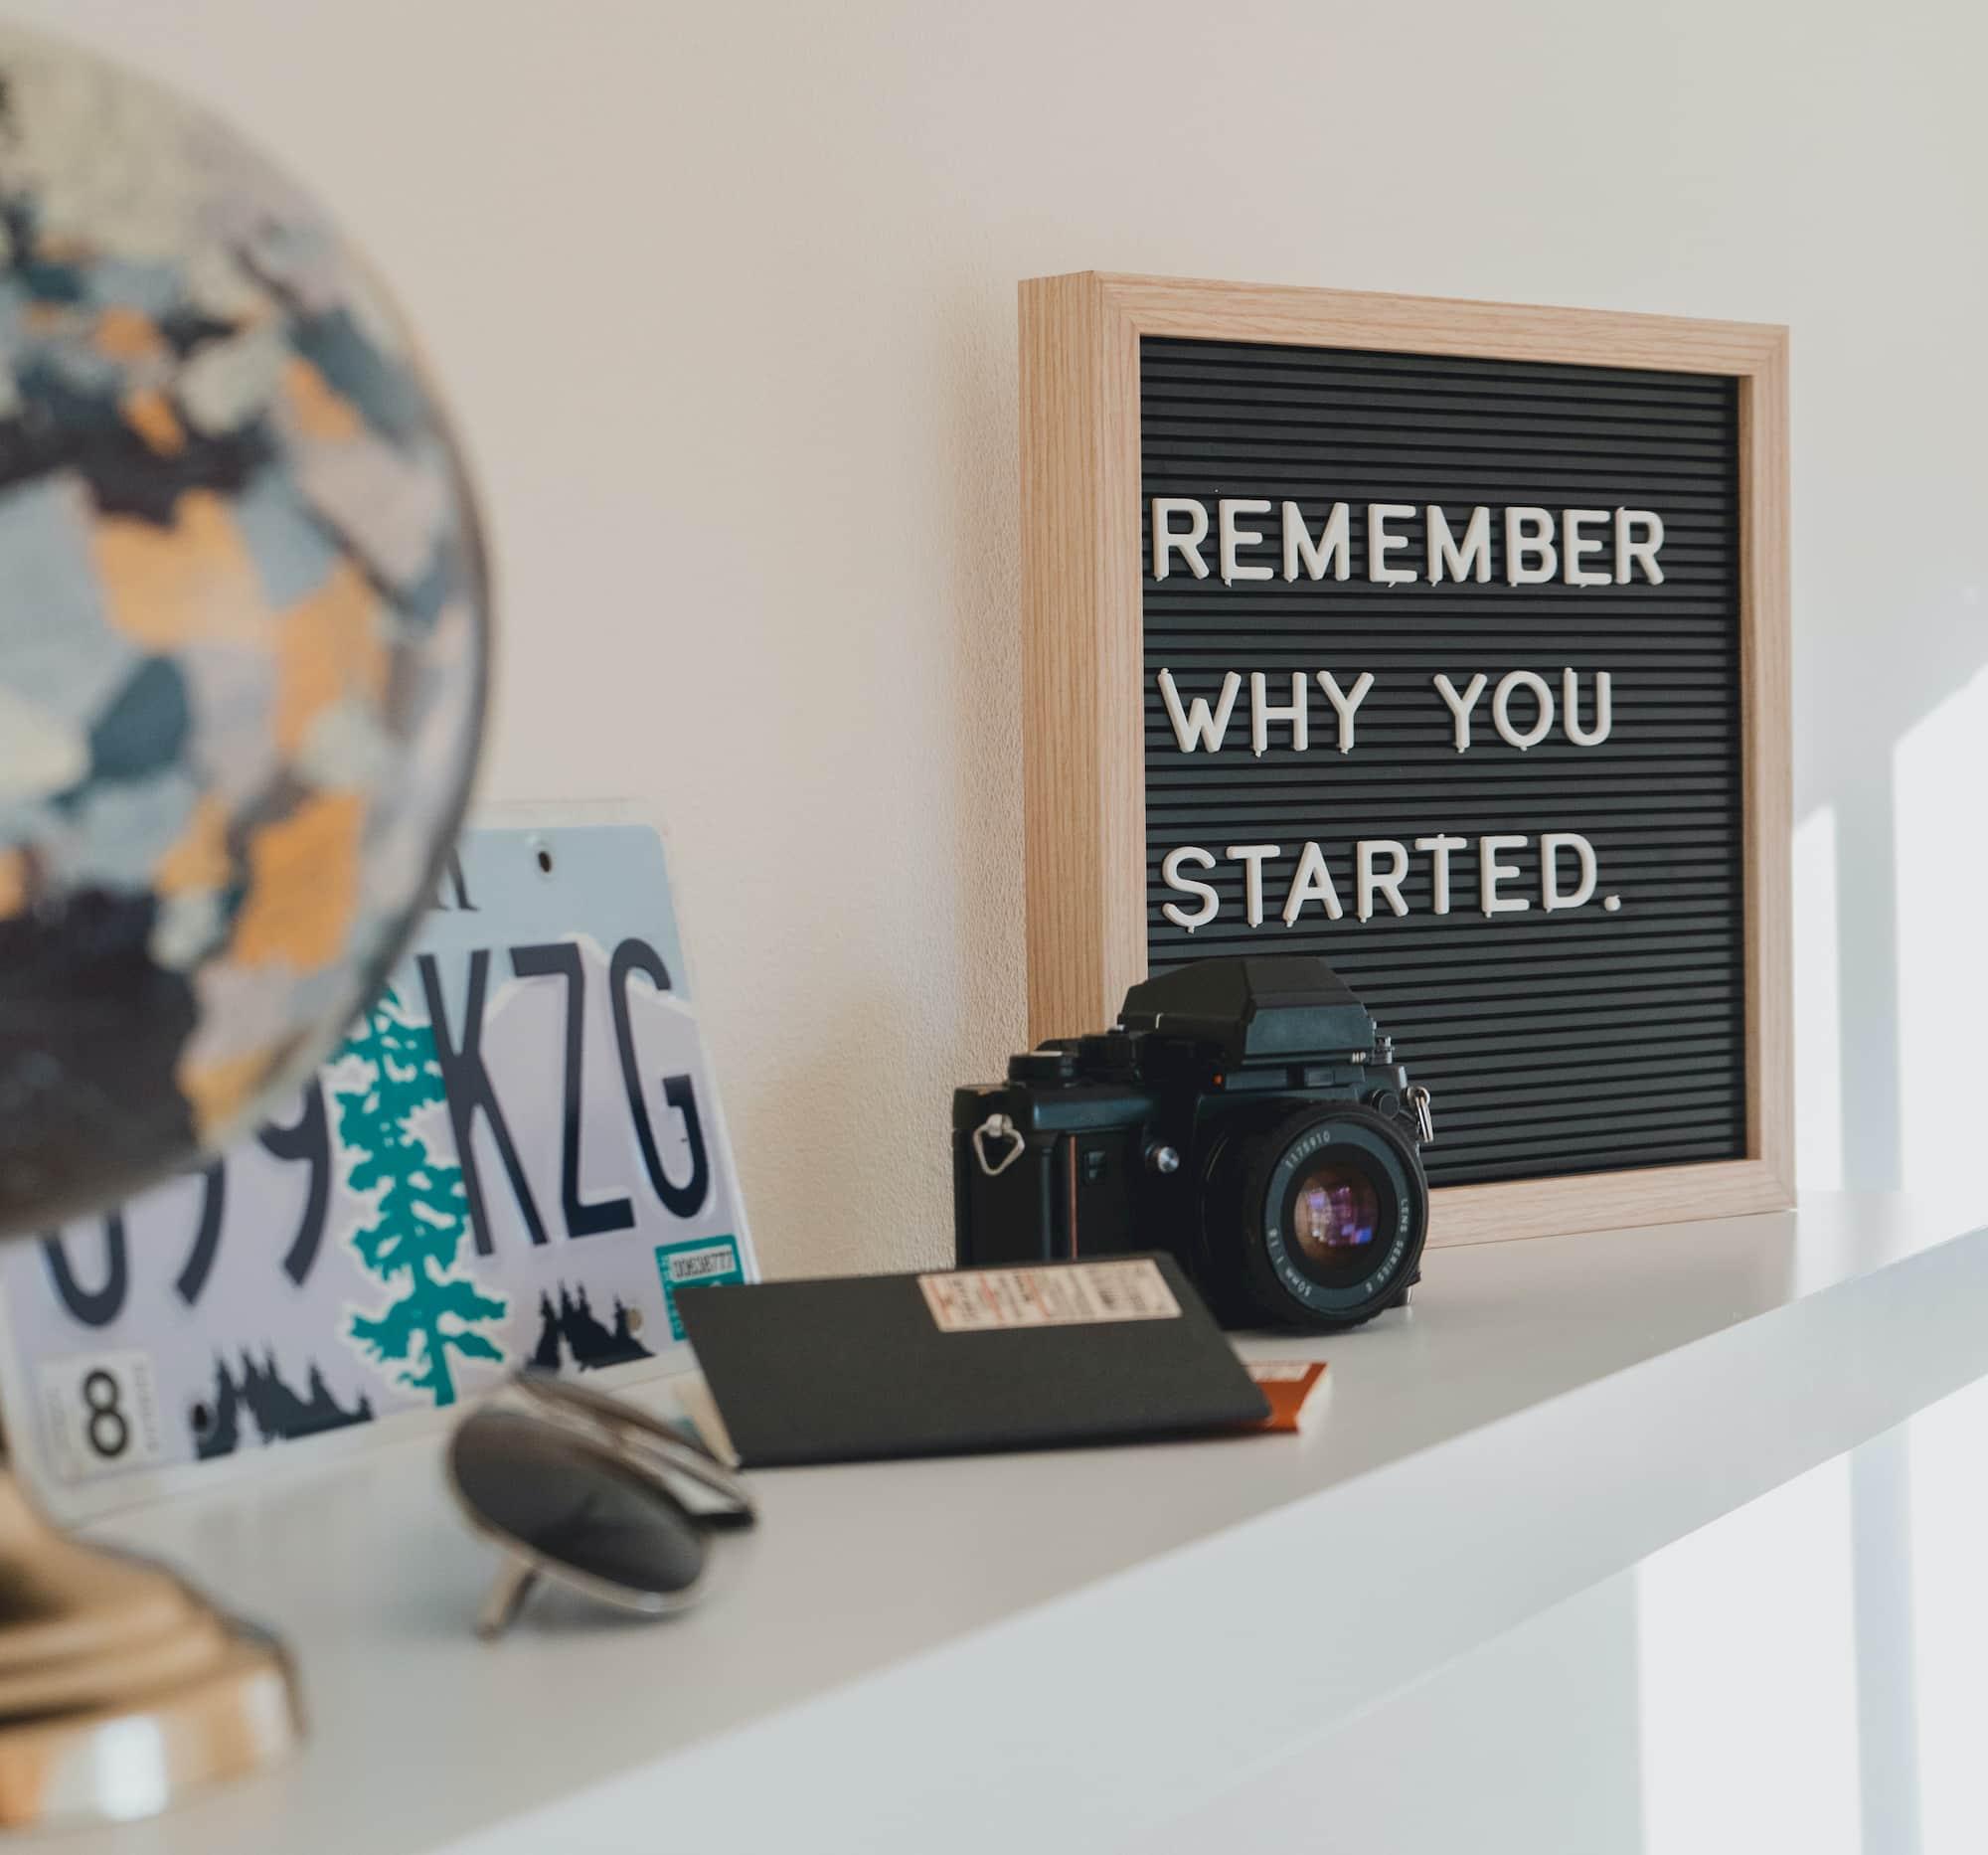 Preventing entrepreneur burnout